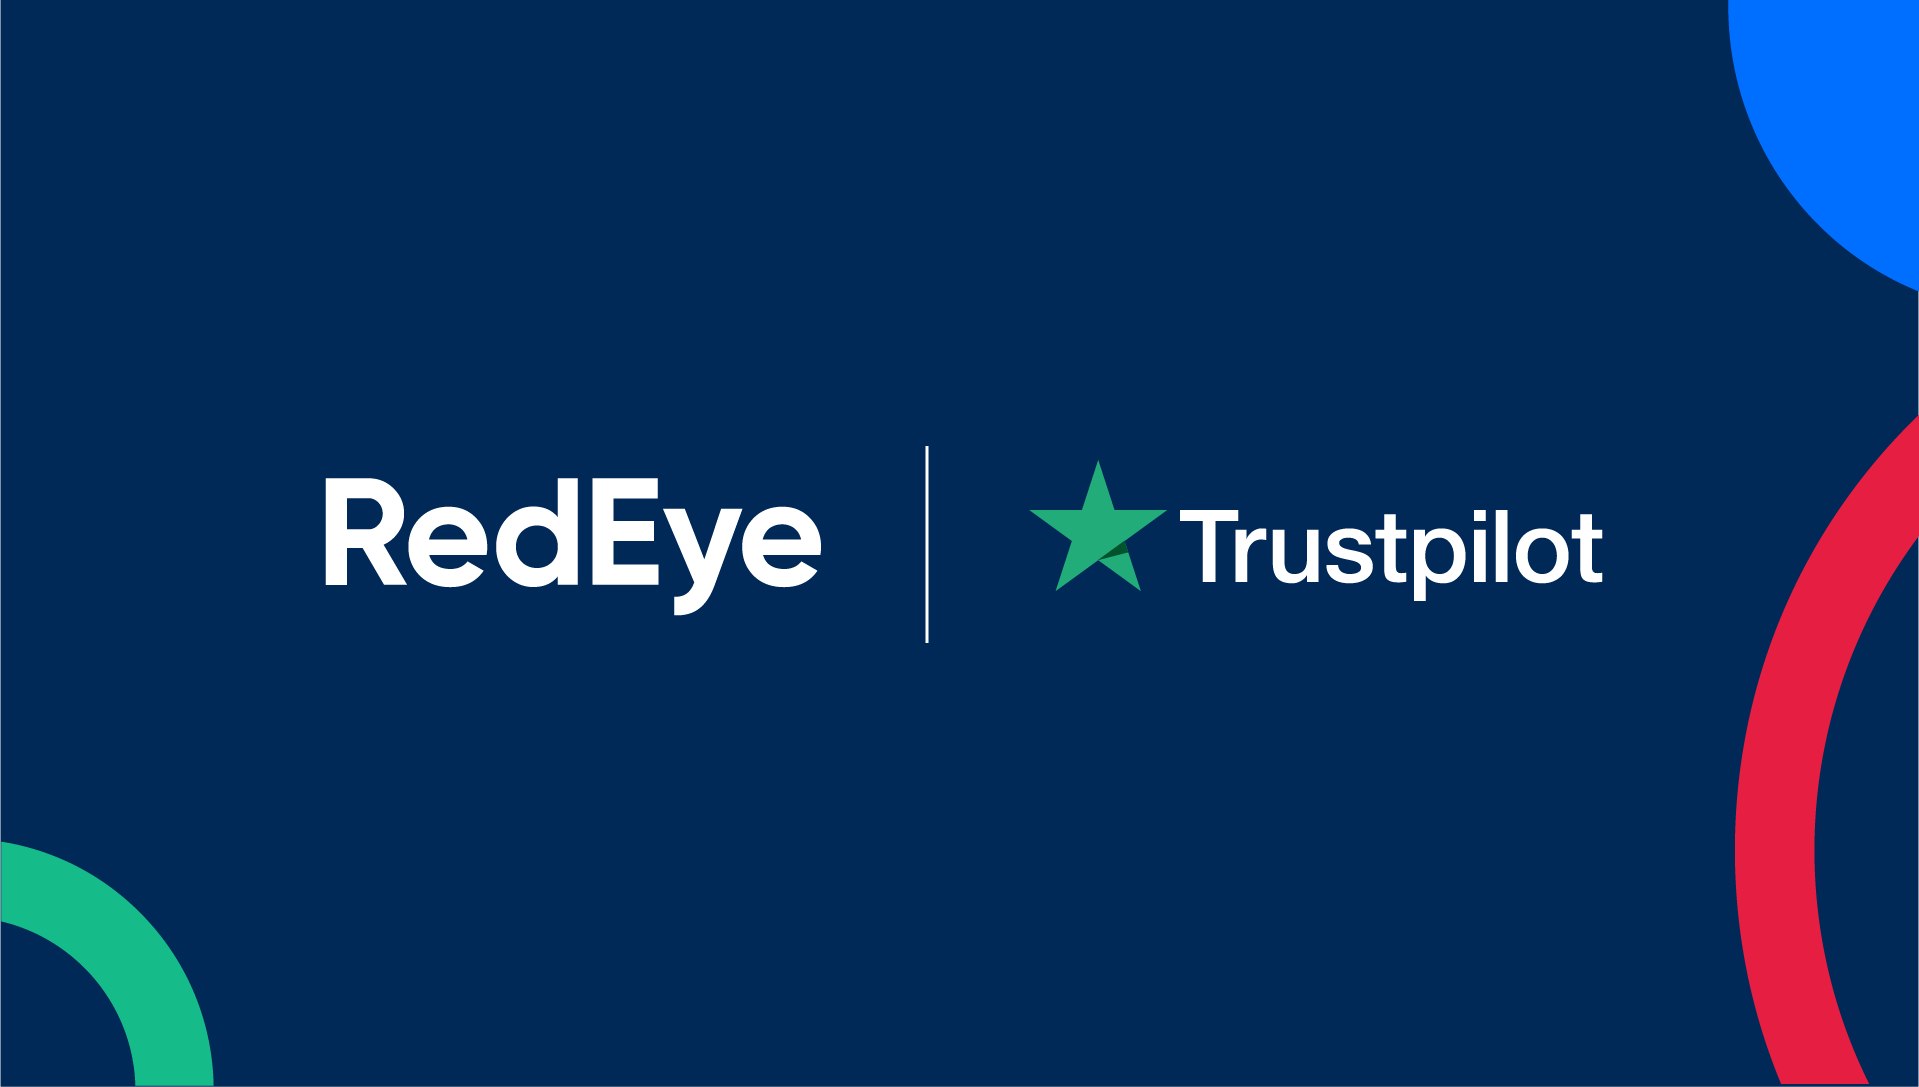 RedEye's Trustpilot Integration